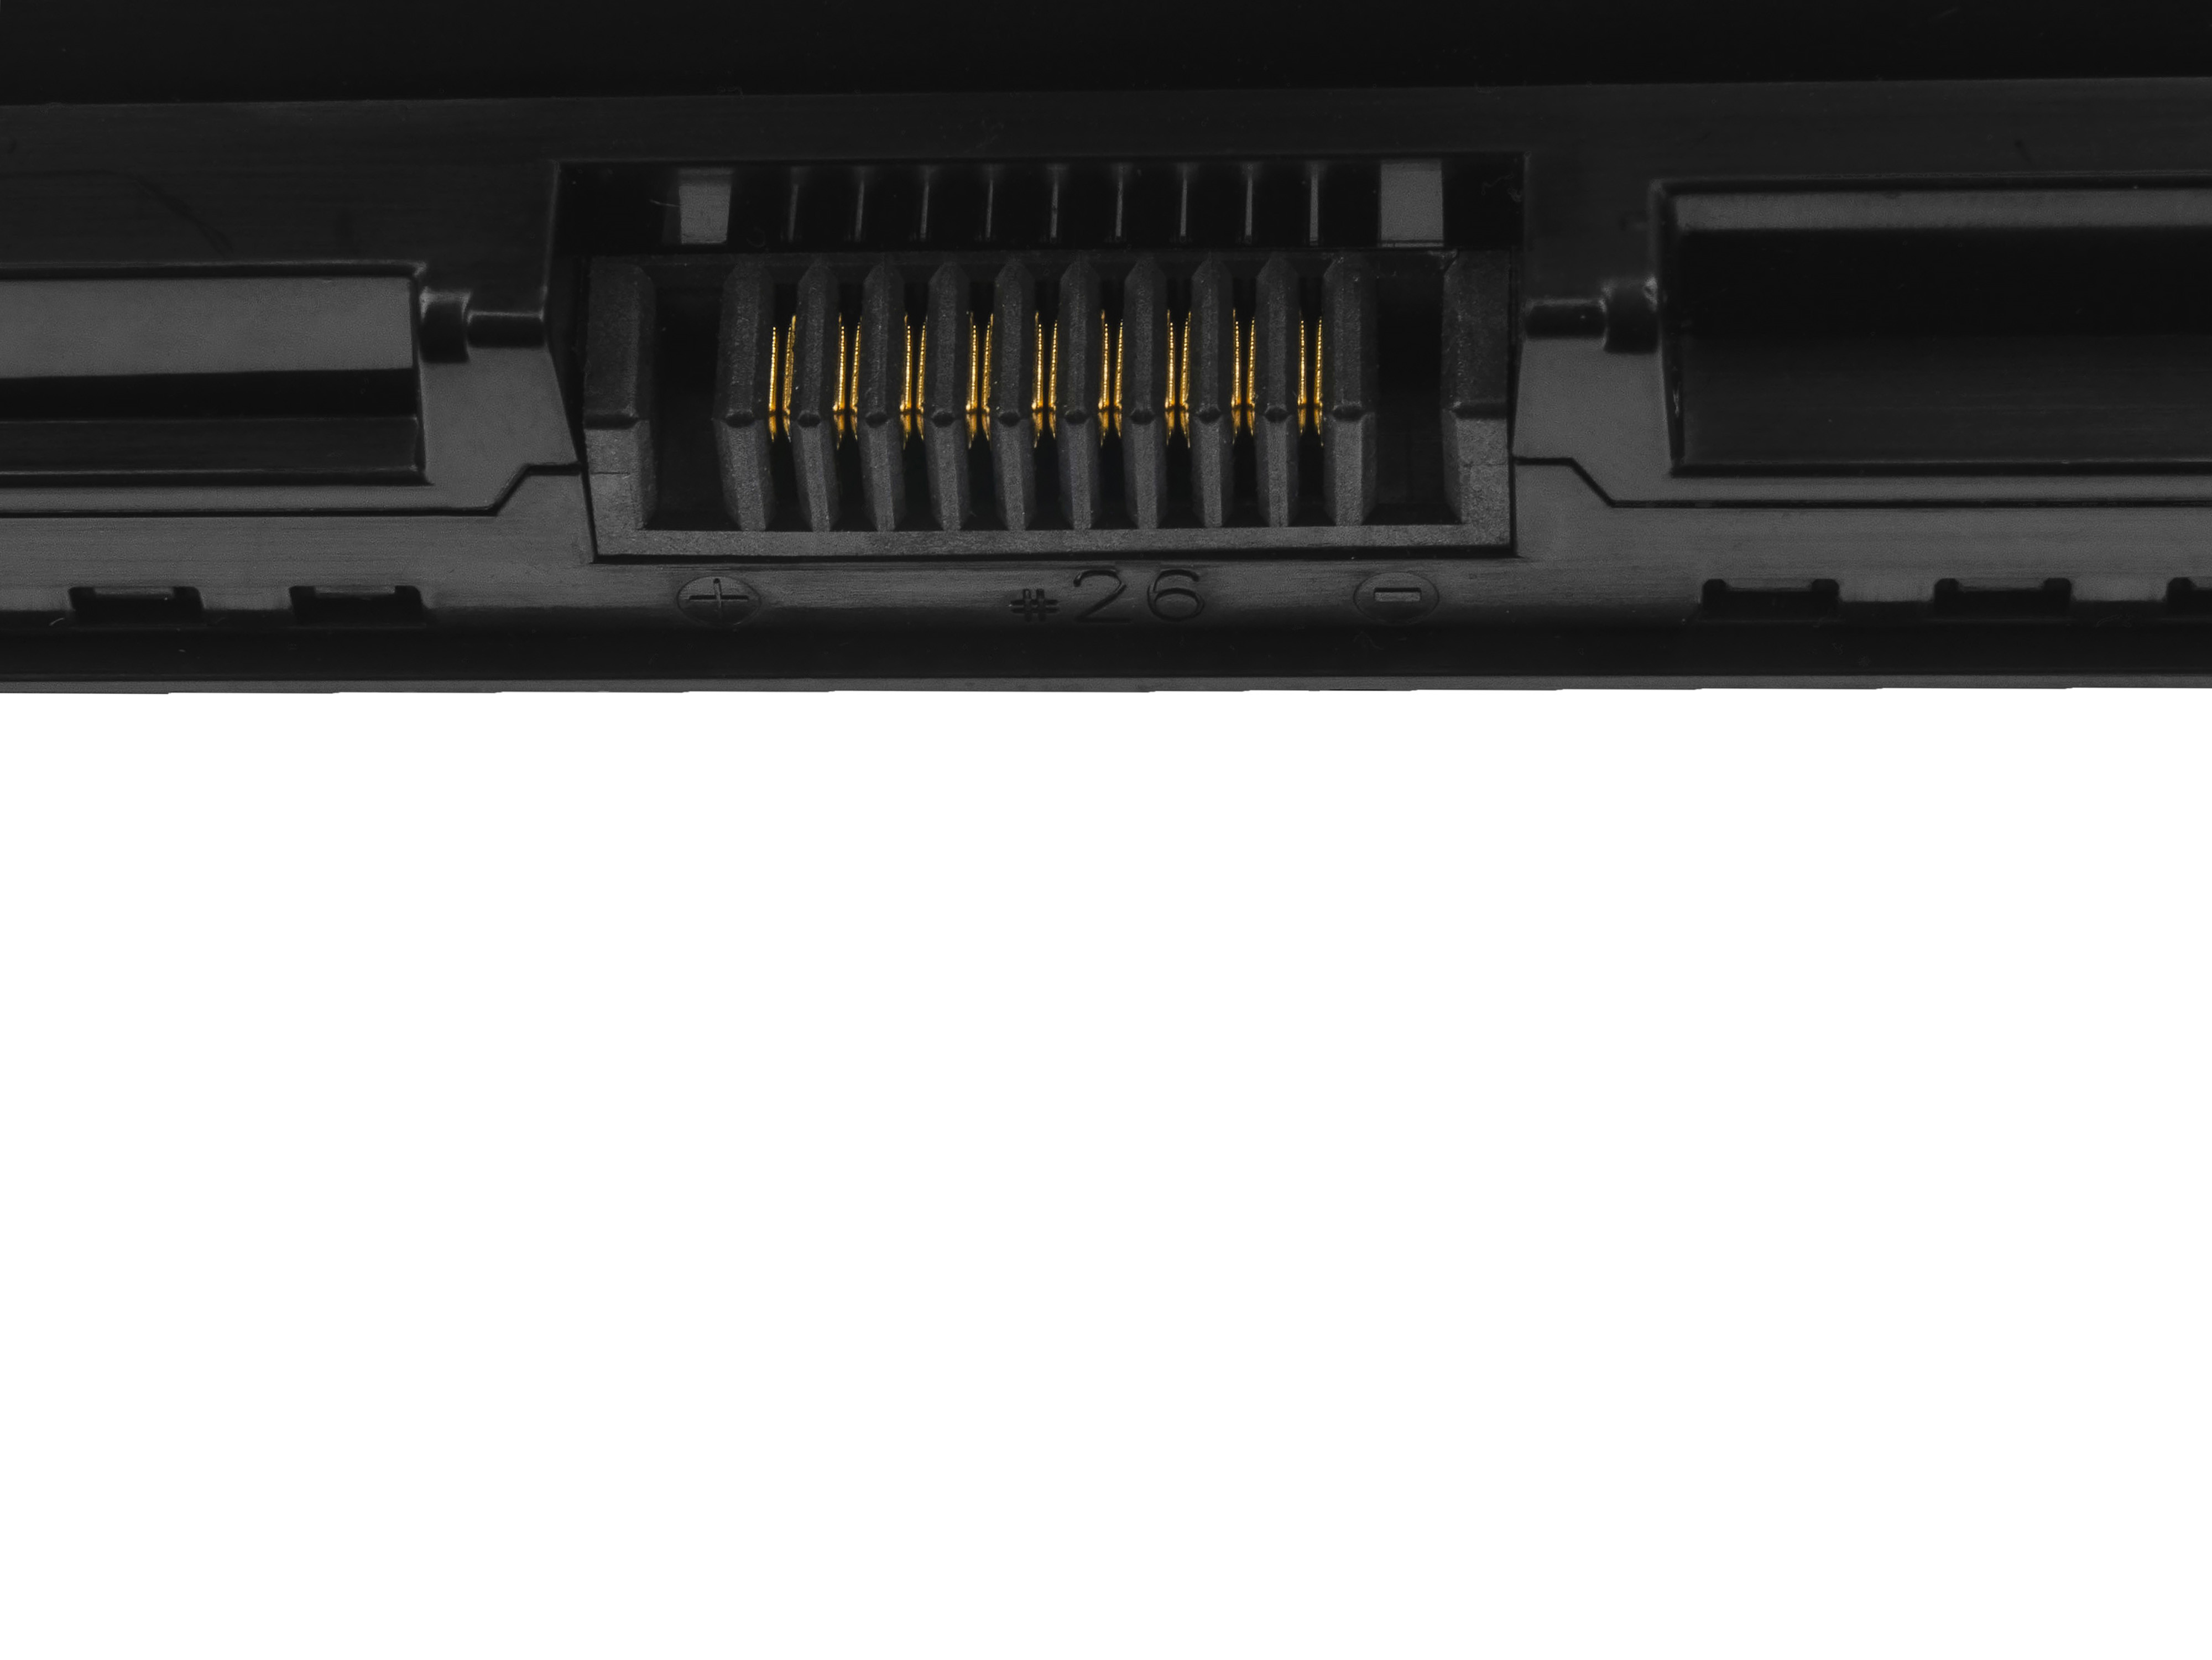 Batteri PA5121U-1BRS PABAS274 för Toshiba Satellite P70-A P70-A-10L P70-A-10W P75-A P75-A7100 P75-A7200